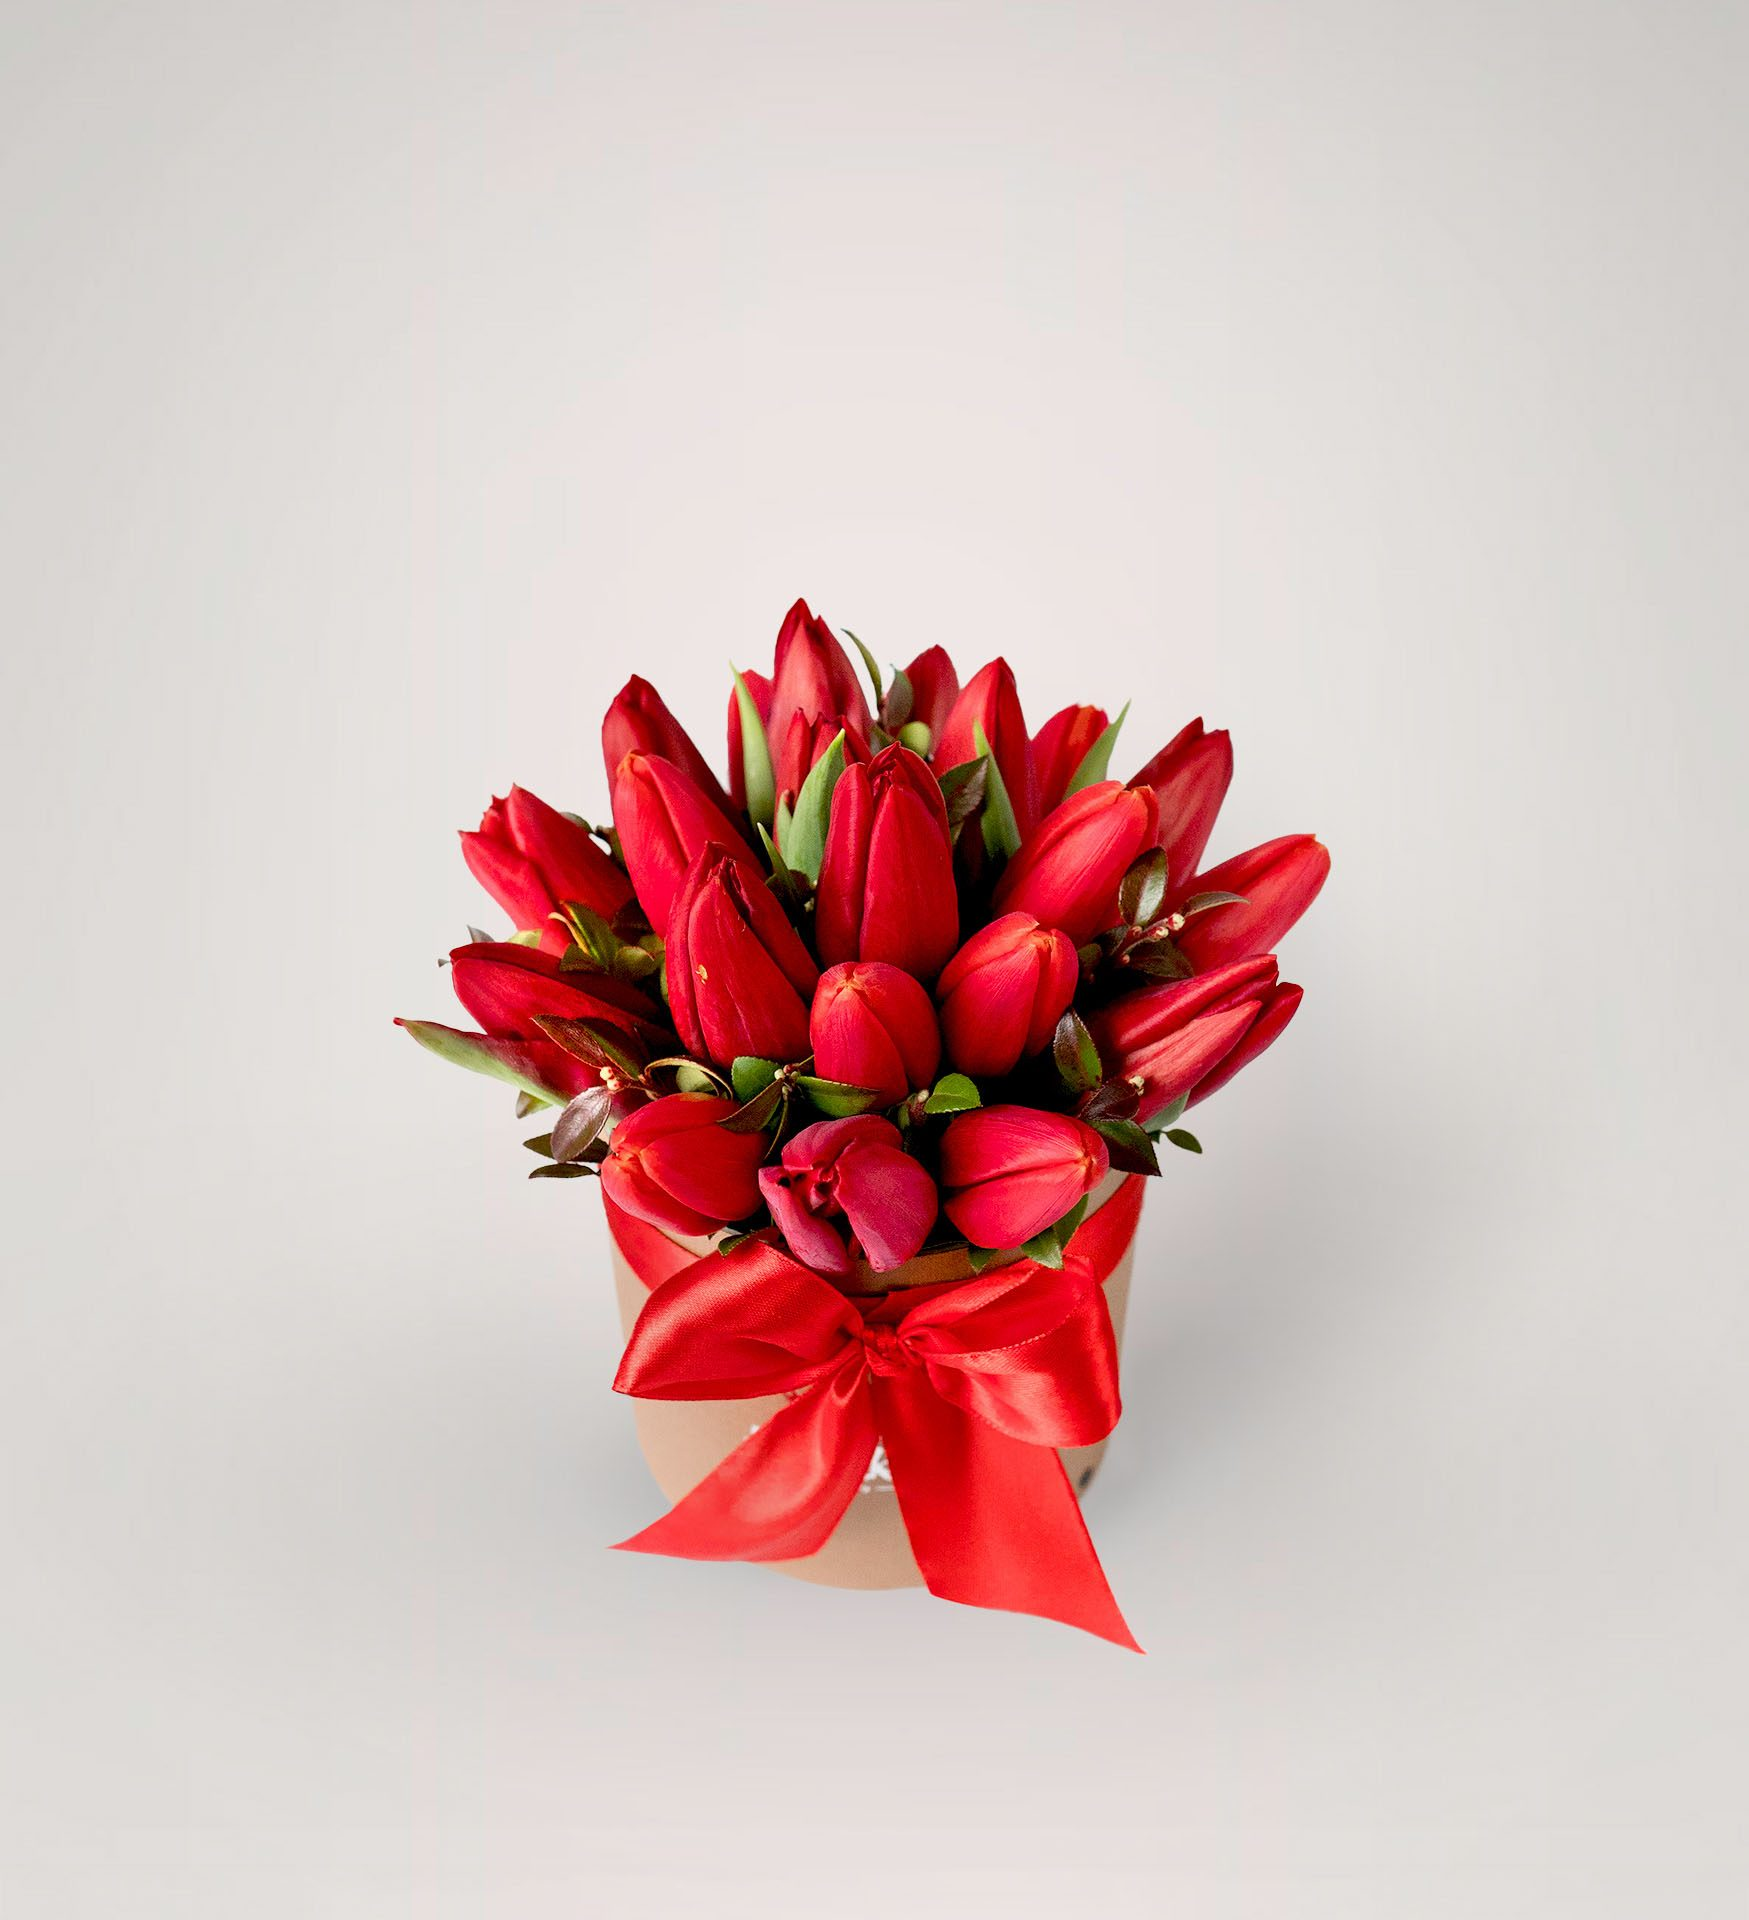 Raudonos tulpes dezuteje